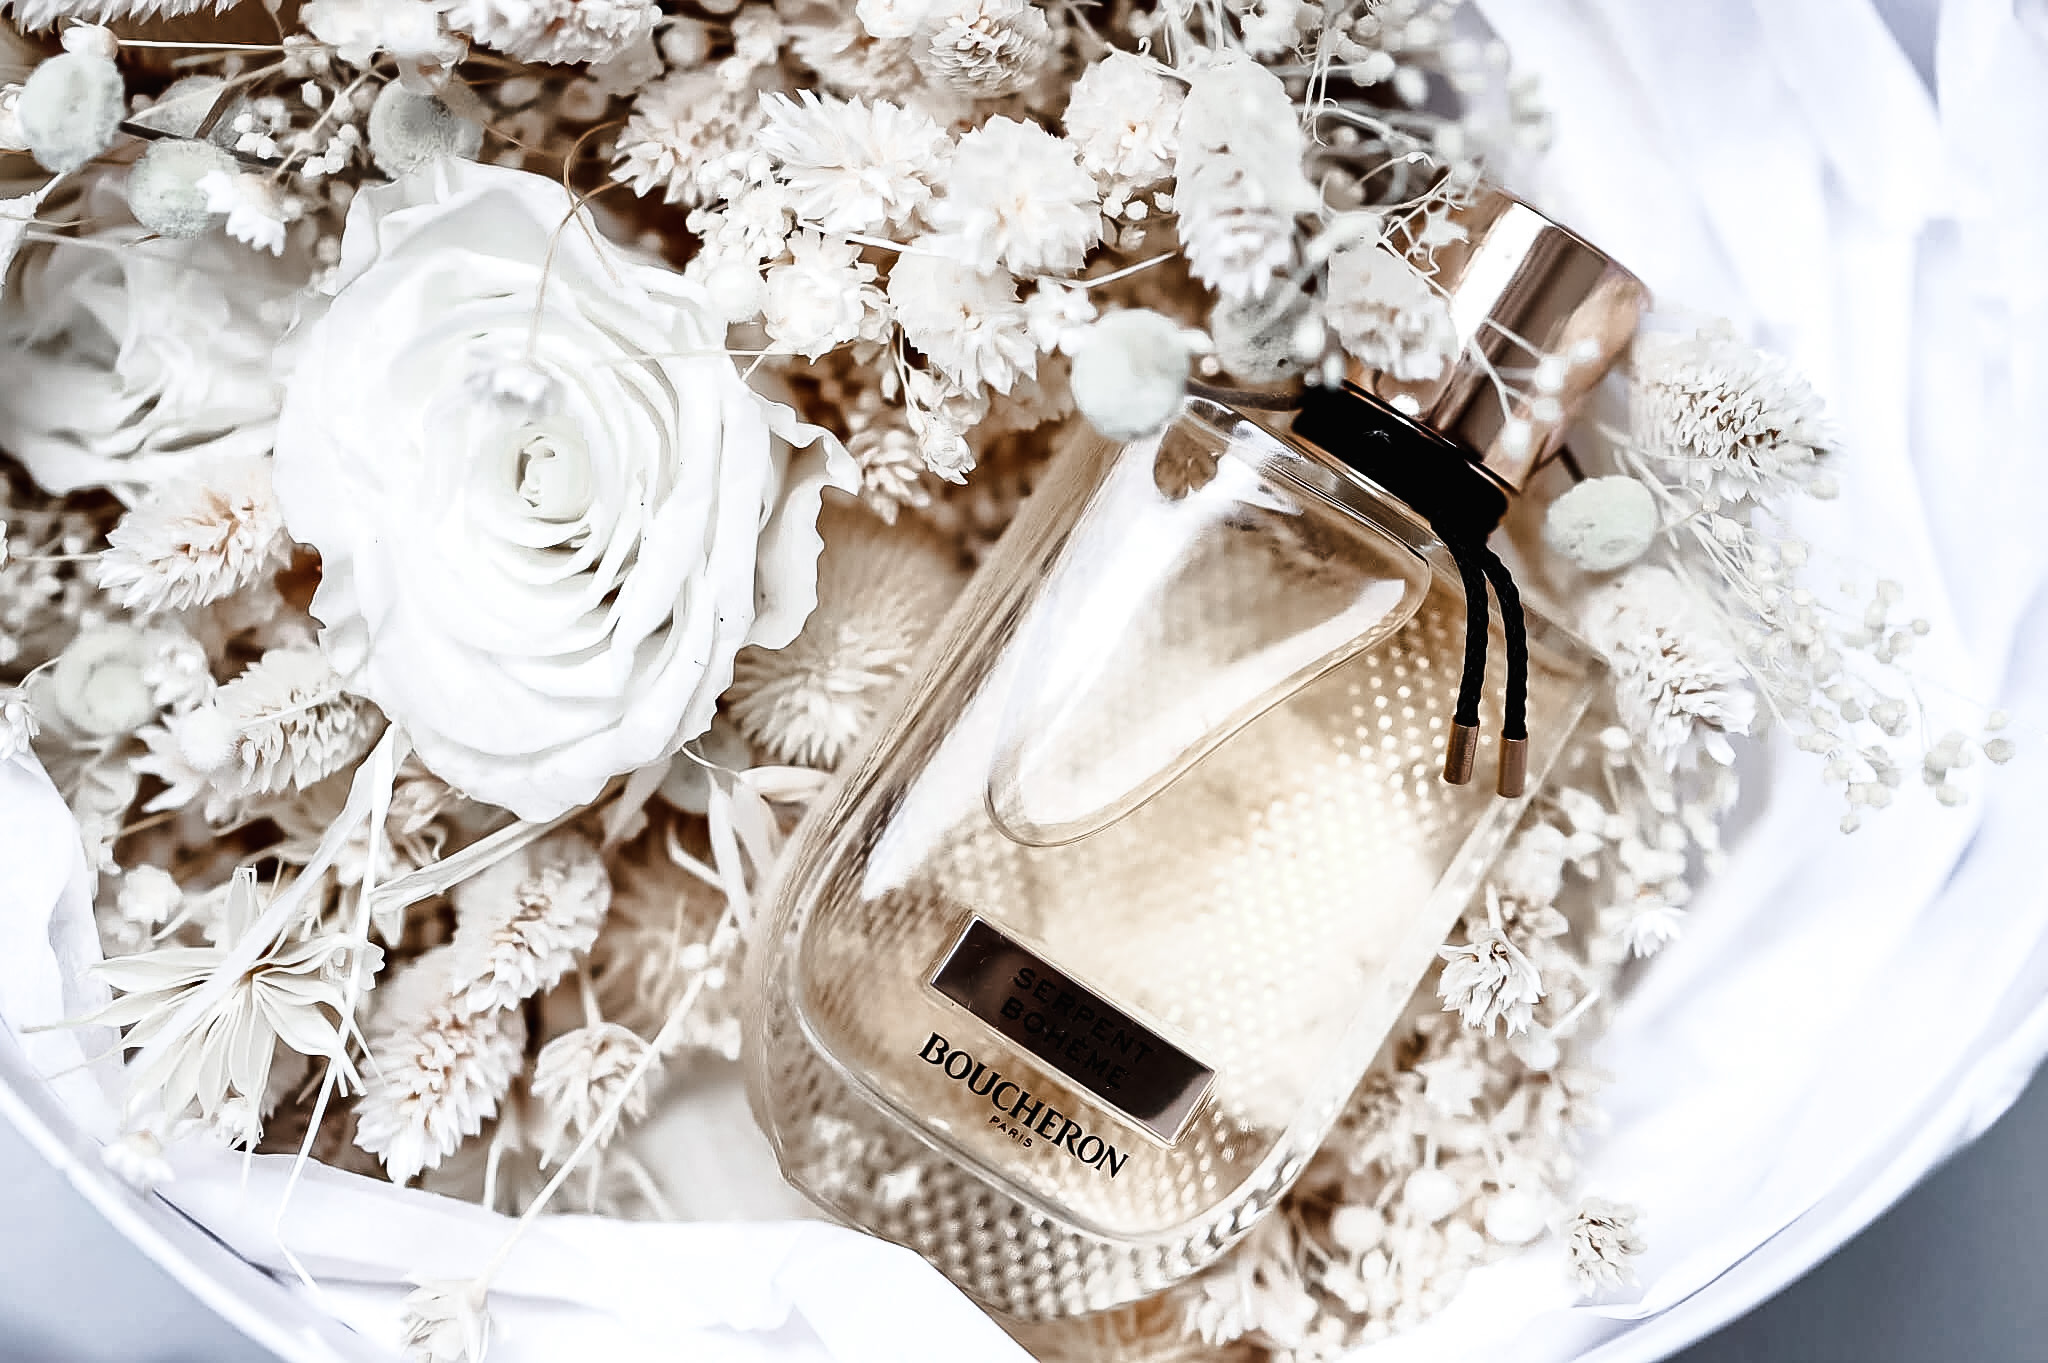 Boucheron Serpent Boheme Parfum